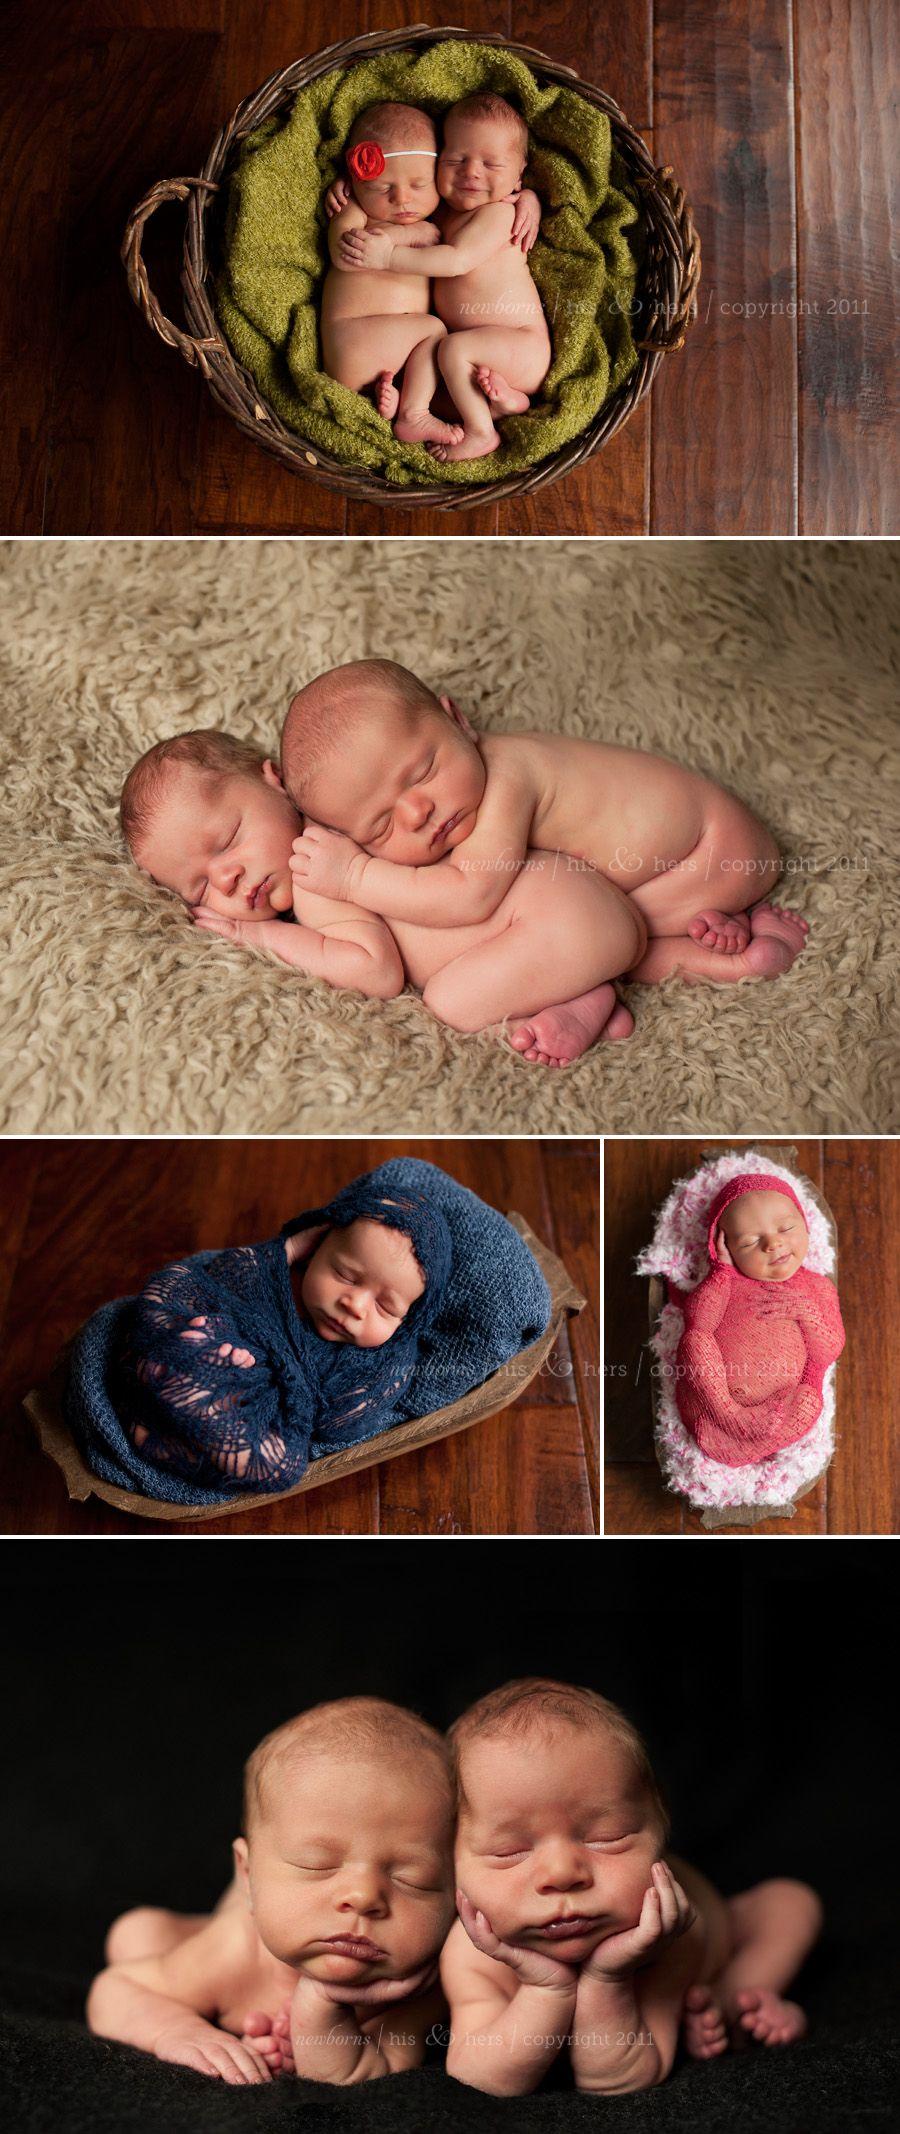 Shiloh & Skyler, Newborn Twins | Des Moines, Iowa Newborn Photography